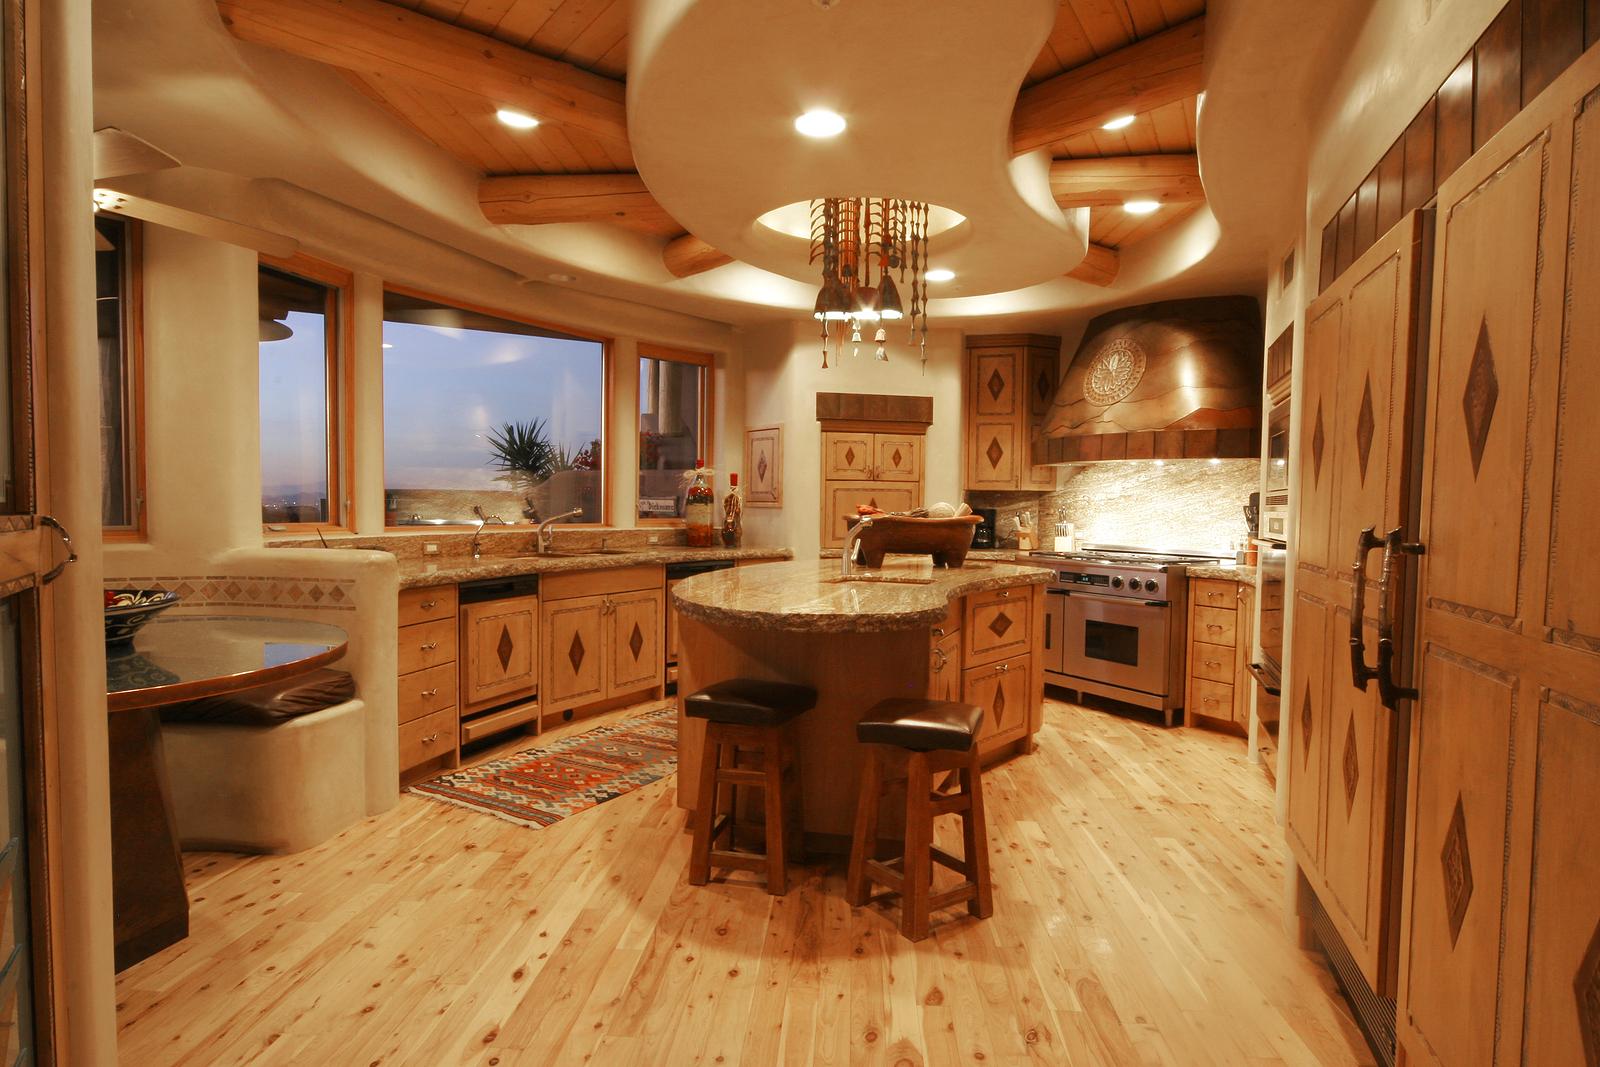 Home styles kitchen island Photo - 5